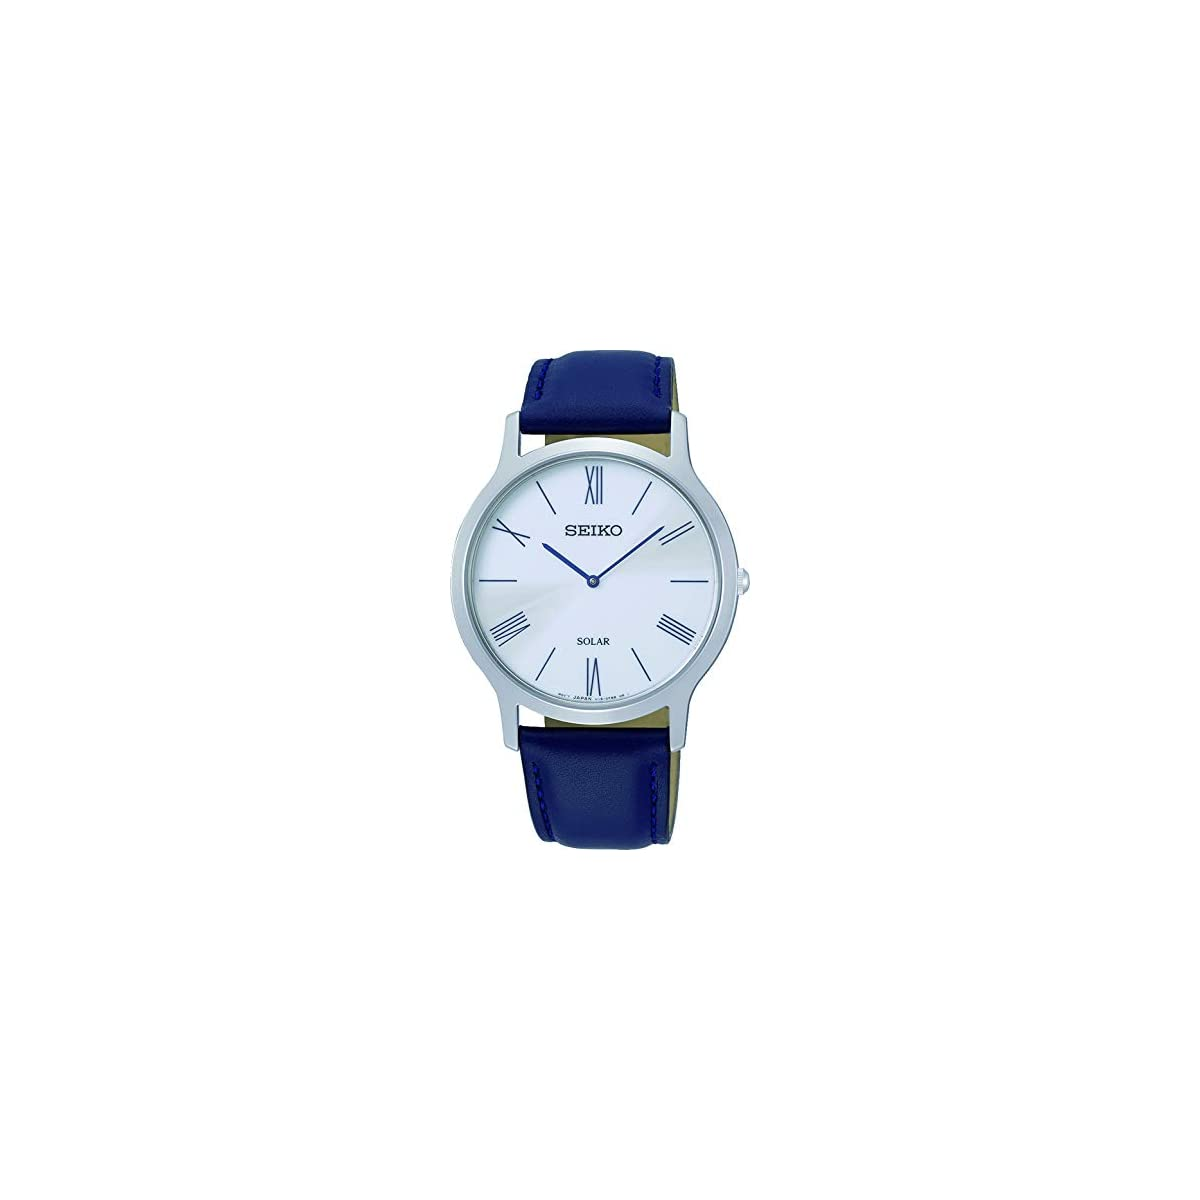 41Lmxyt2VeL. SS1200  - Seiko Reloj de Pulsera SUP857P1